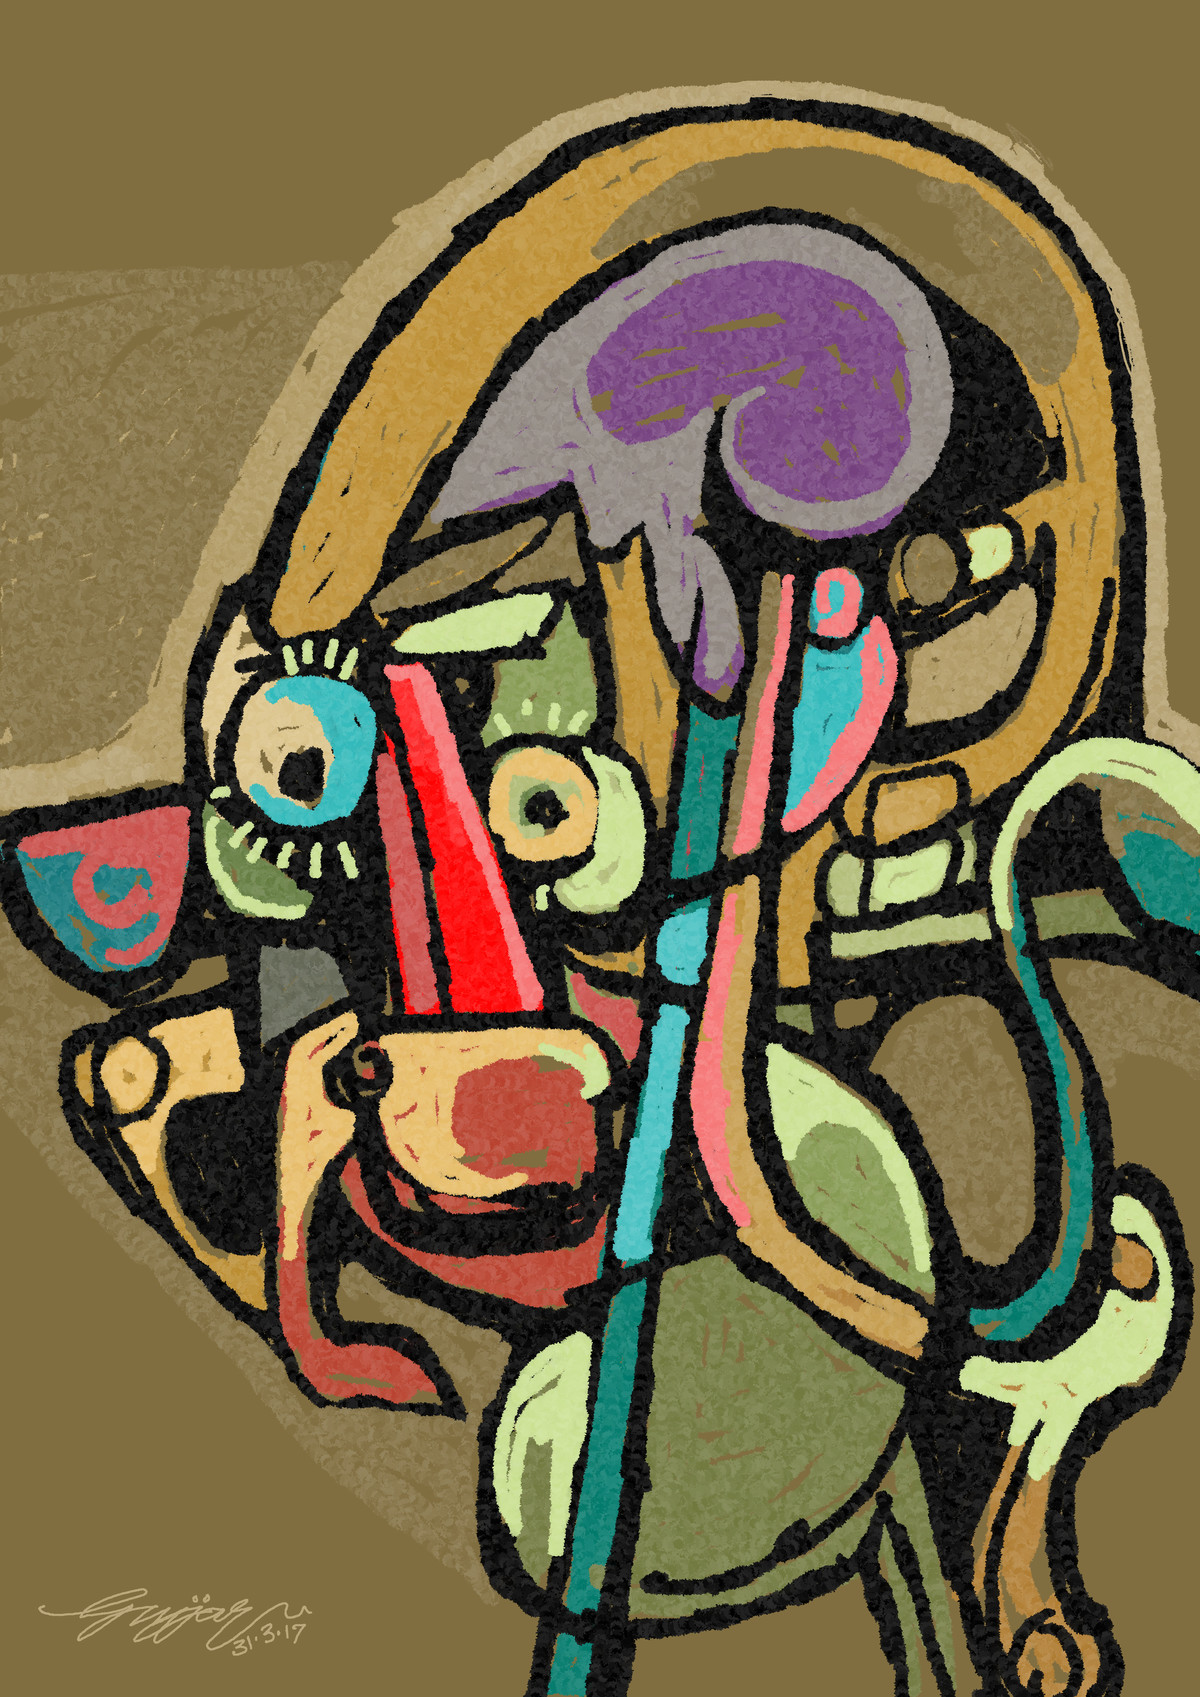 untitled by Gujjarappa B G, Digital Digital Art, Digital Print on Canvas, Brown color